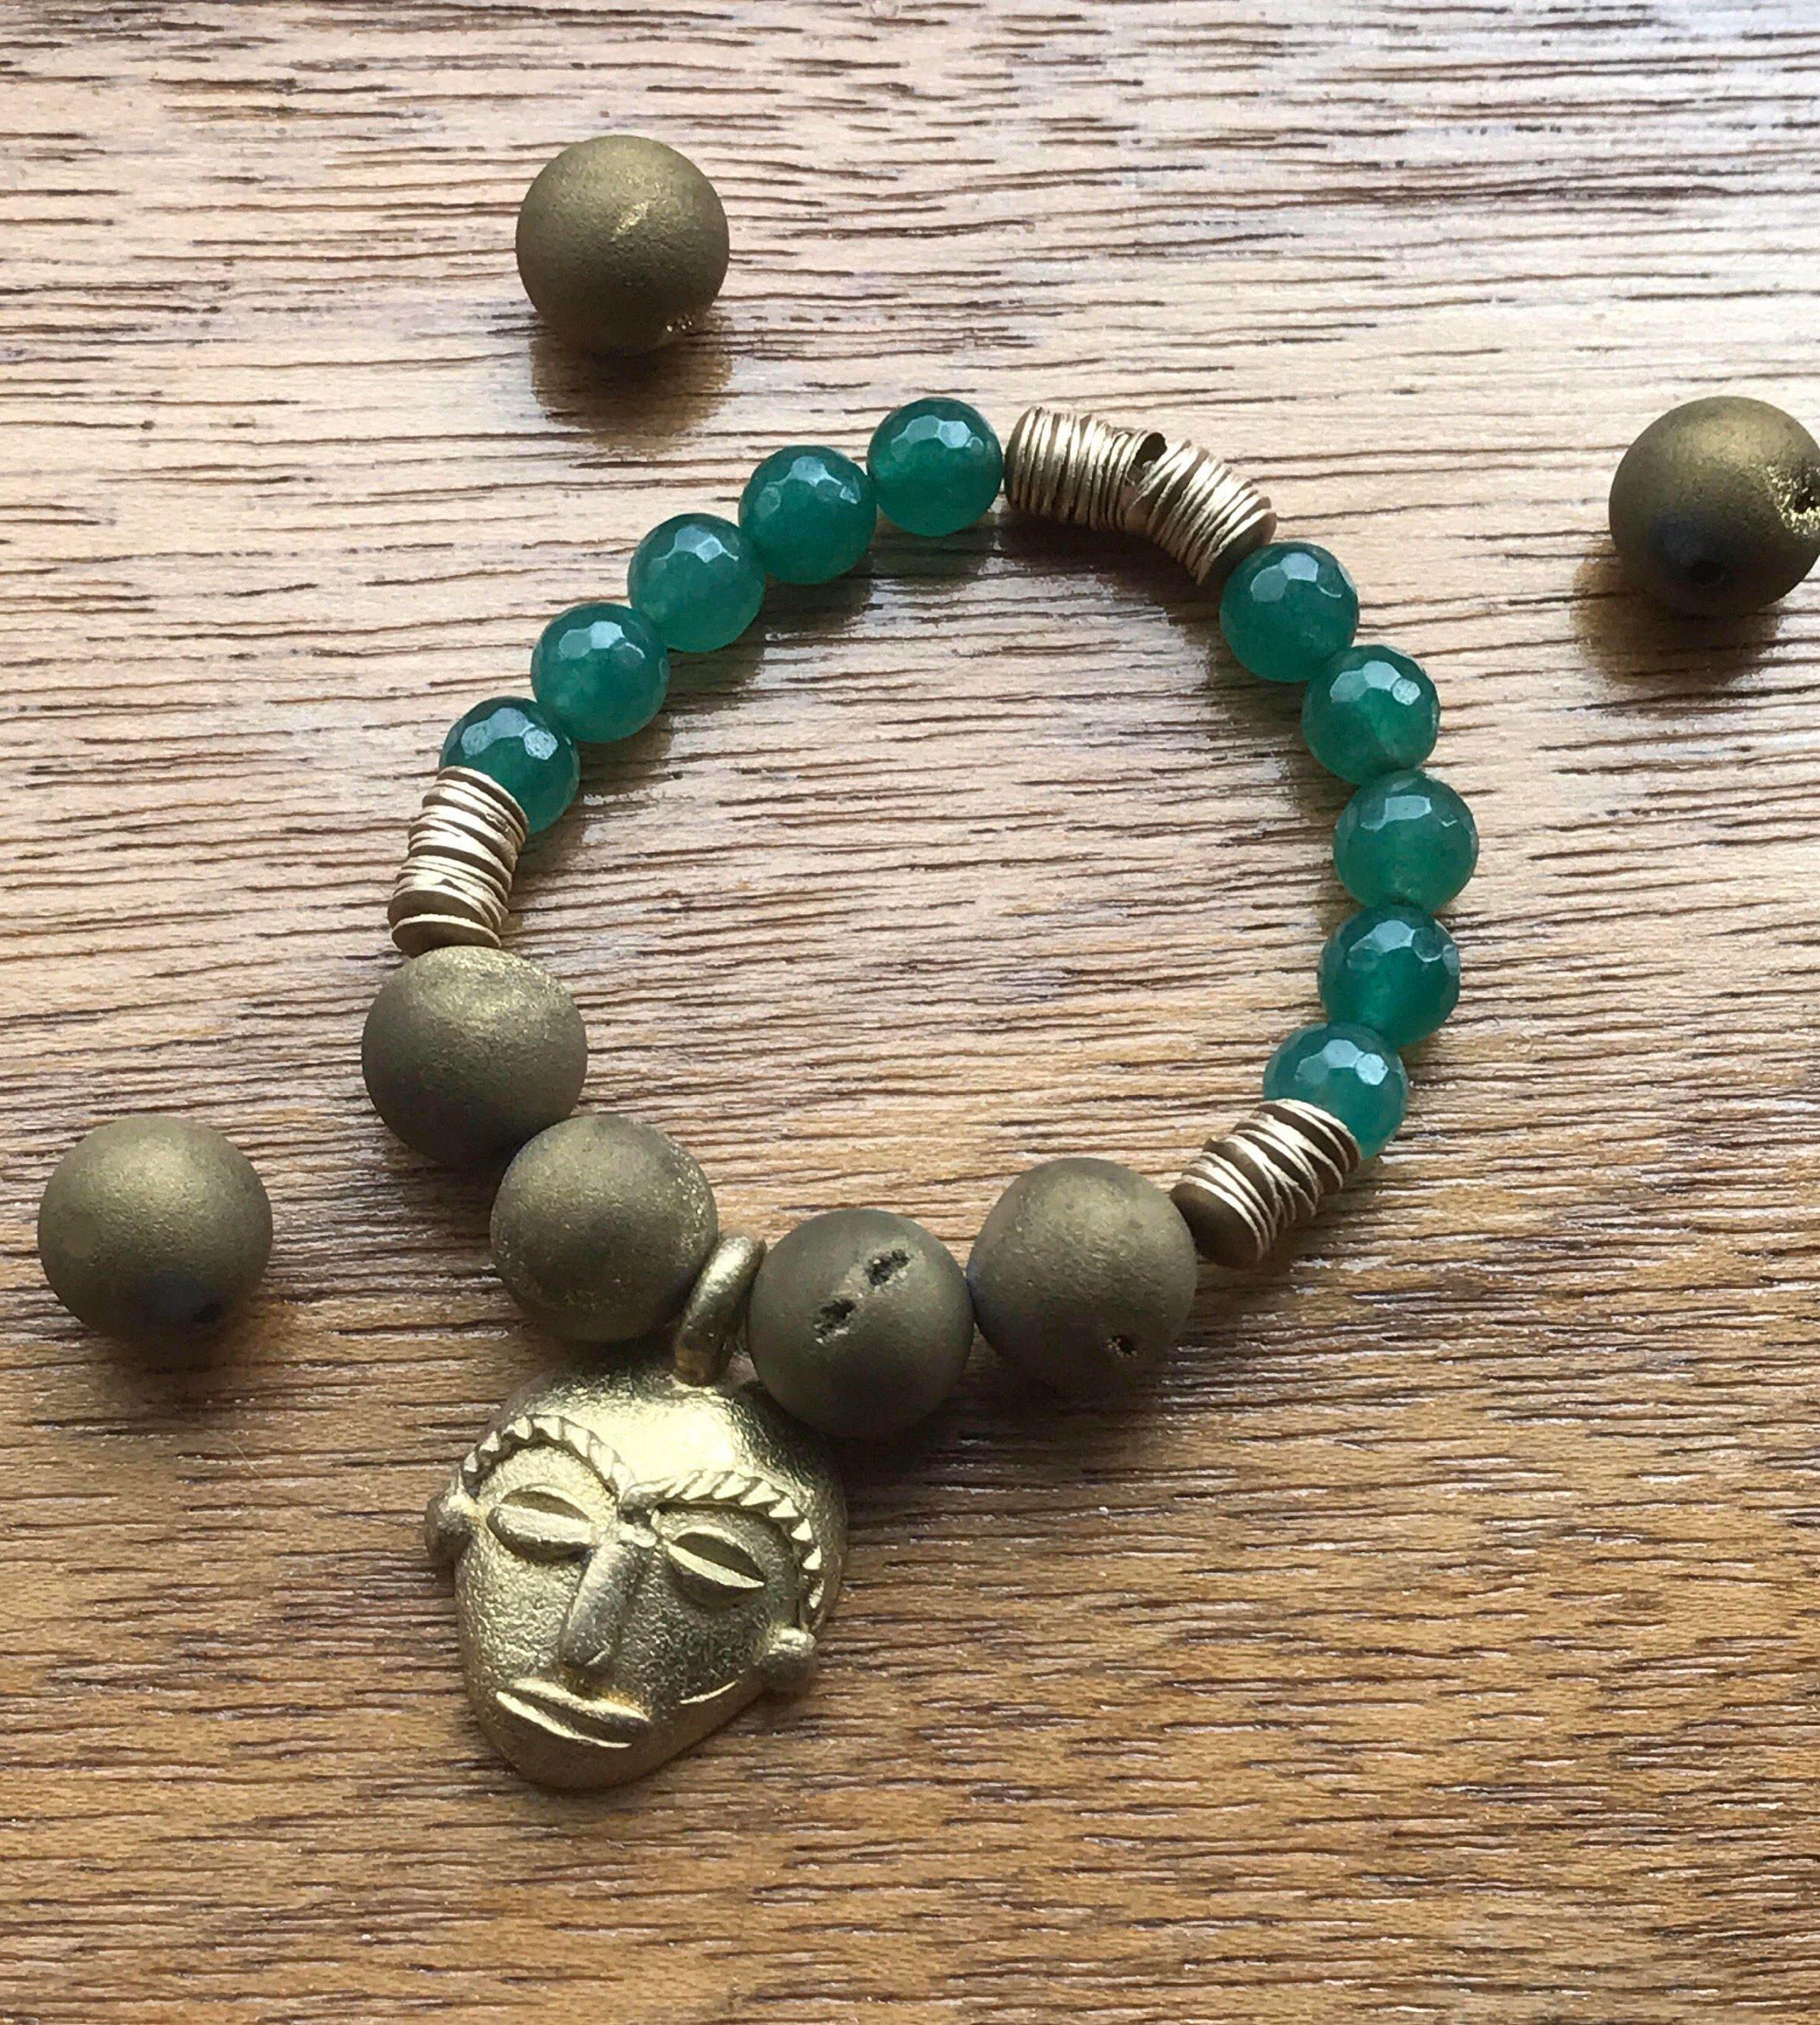 African Gemstone Charm Bracelet Stretch Bracelet Agate Gemstone heishi bracelet Green Jade Bracelet Mask Charm Bracelet